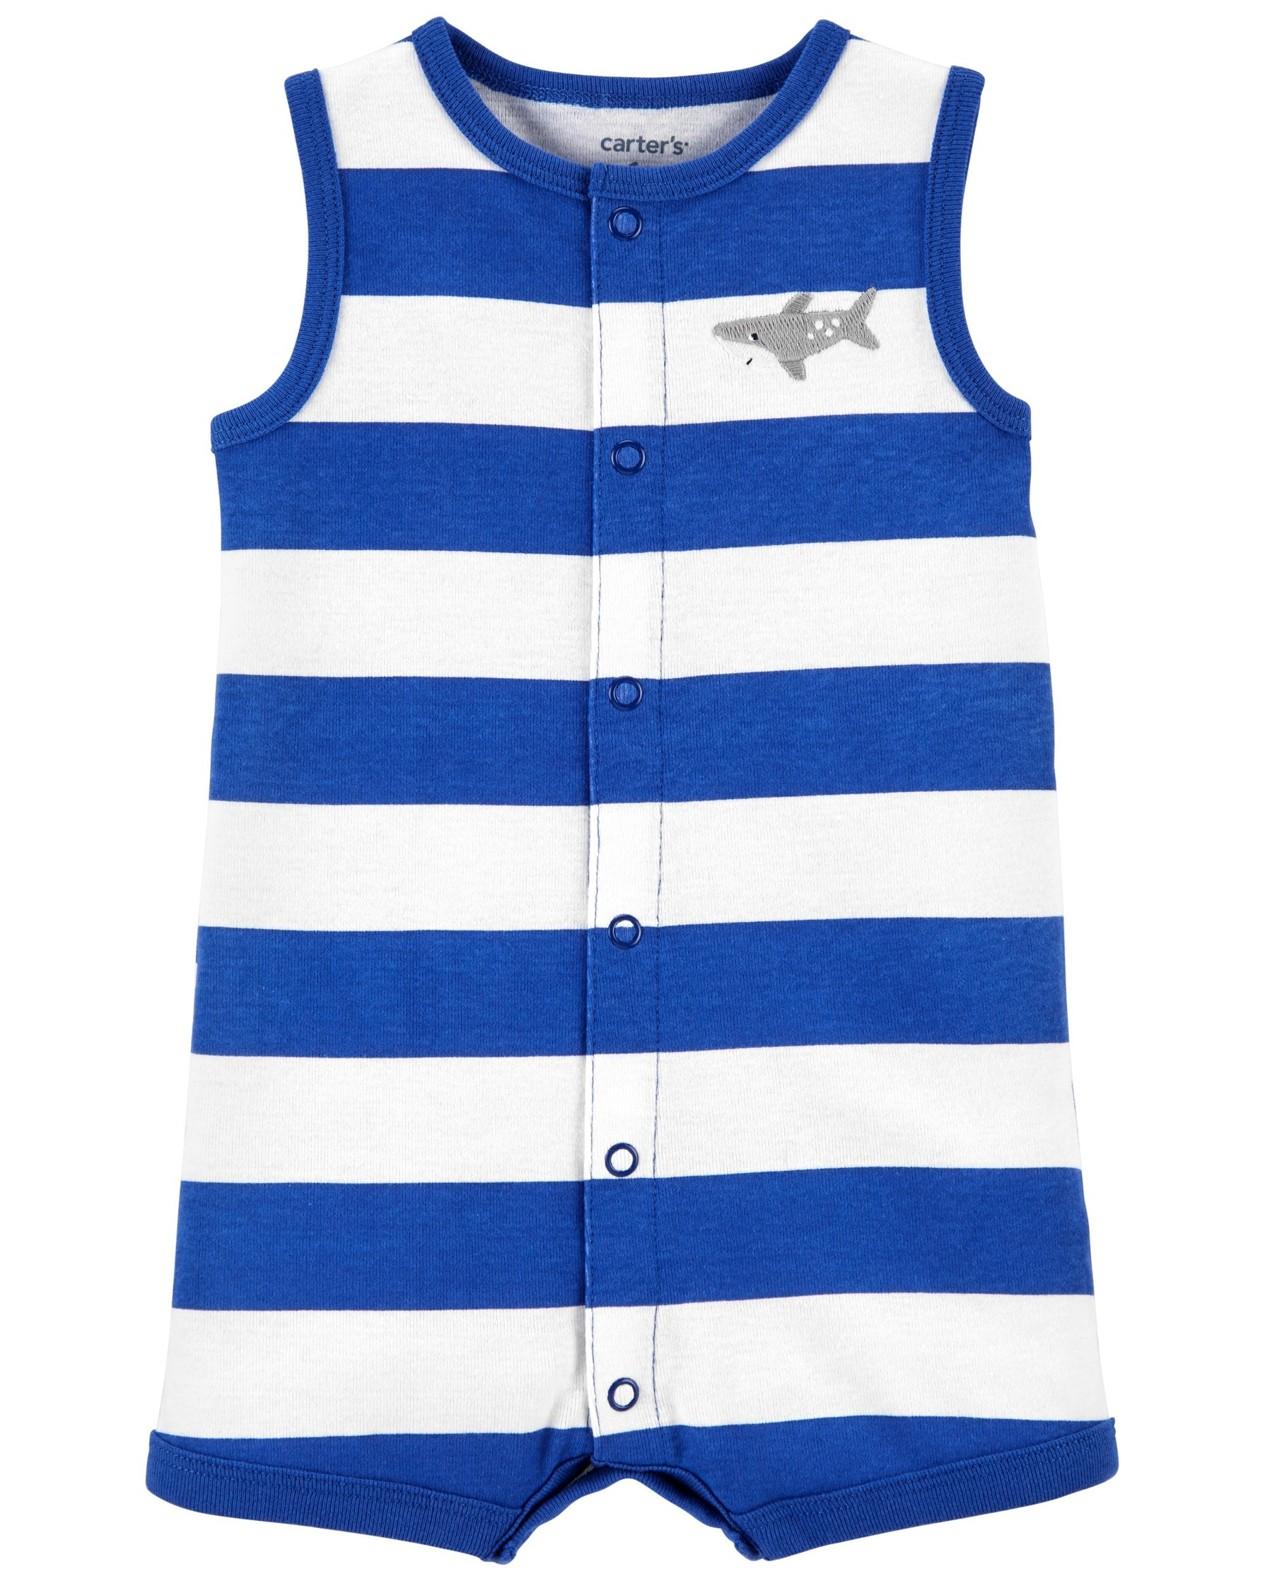 CARTER'S Opaľovačky Blue Stripe Shark chlapec 6 m, veľ. 68